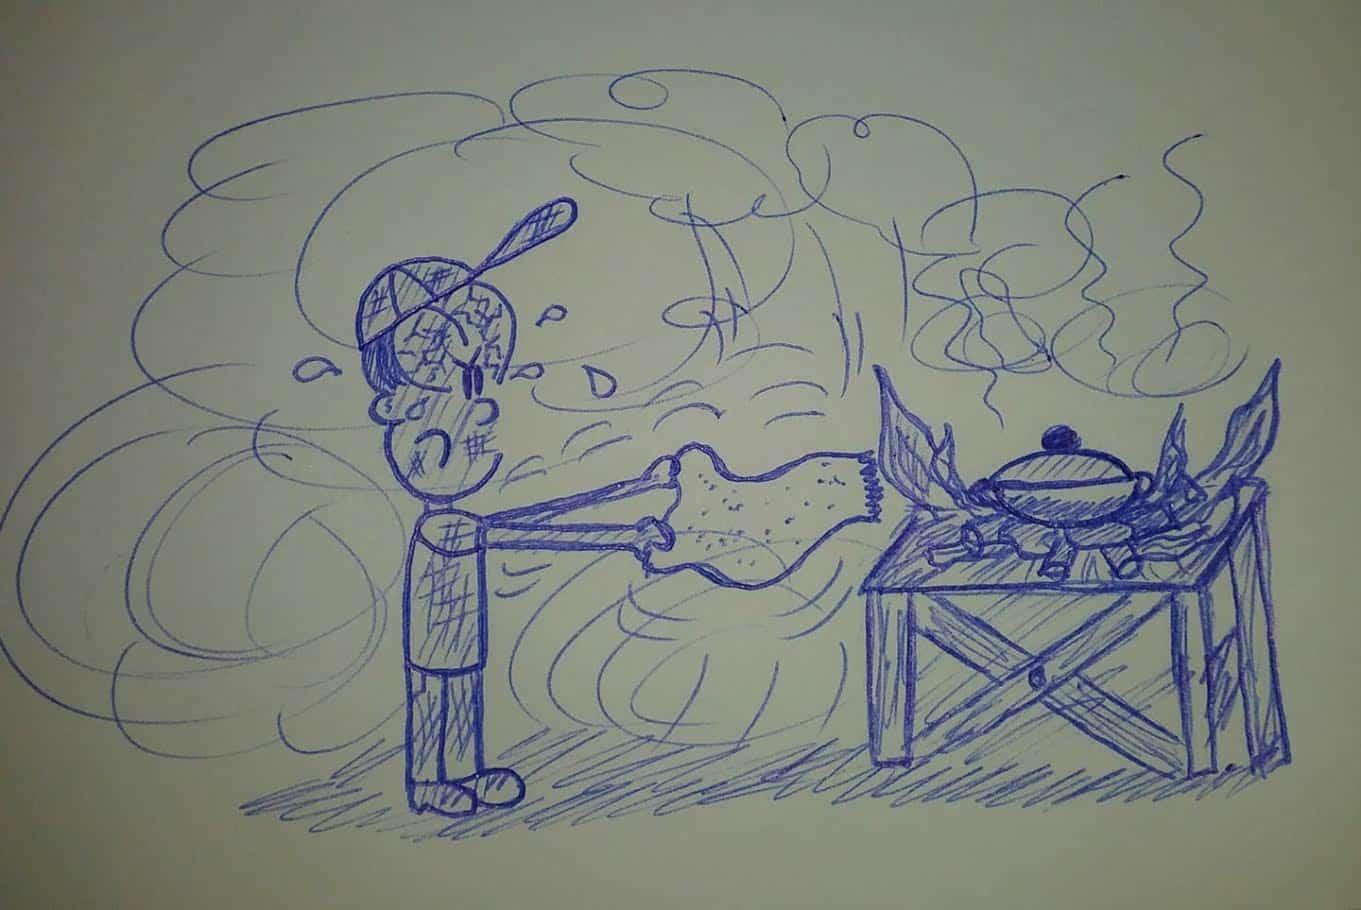 caricatura cocinando con leña